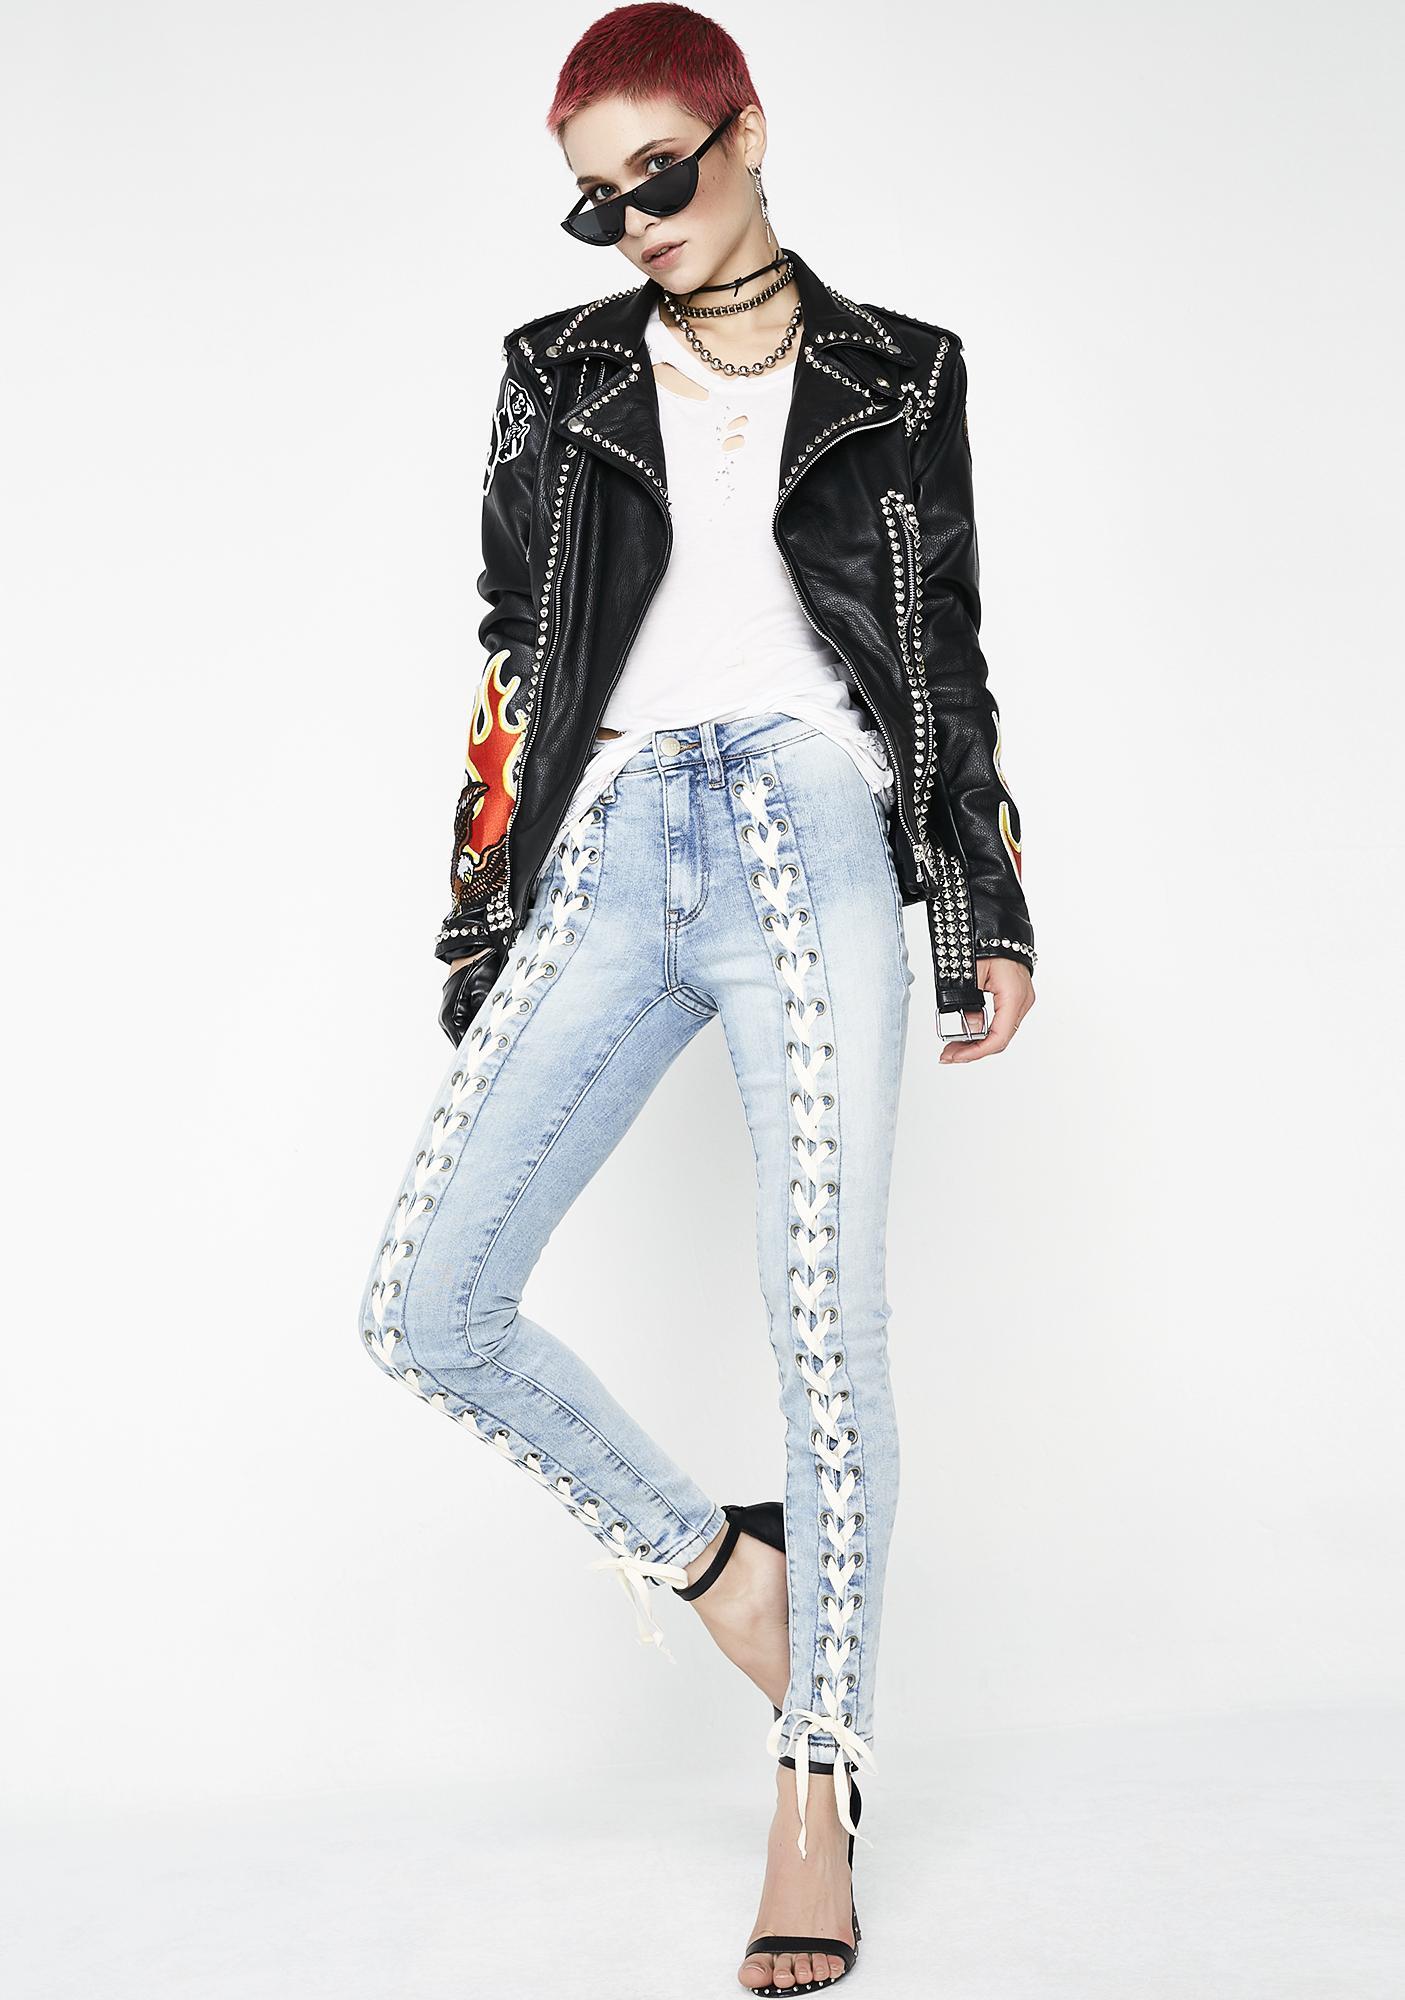 Neon Blonde Blondie Tie Up Jeans